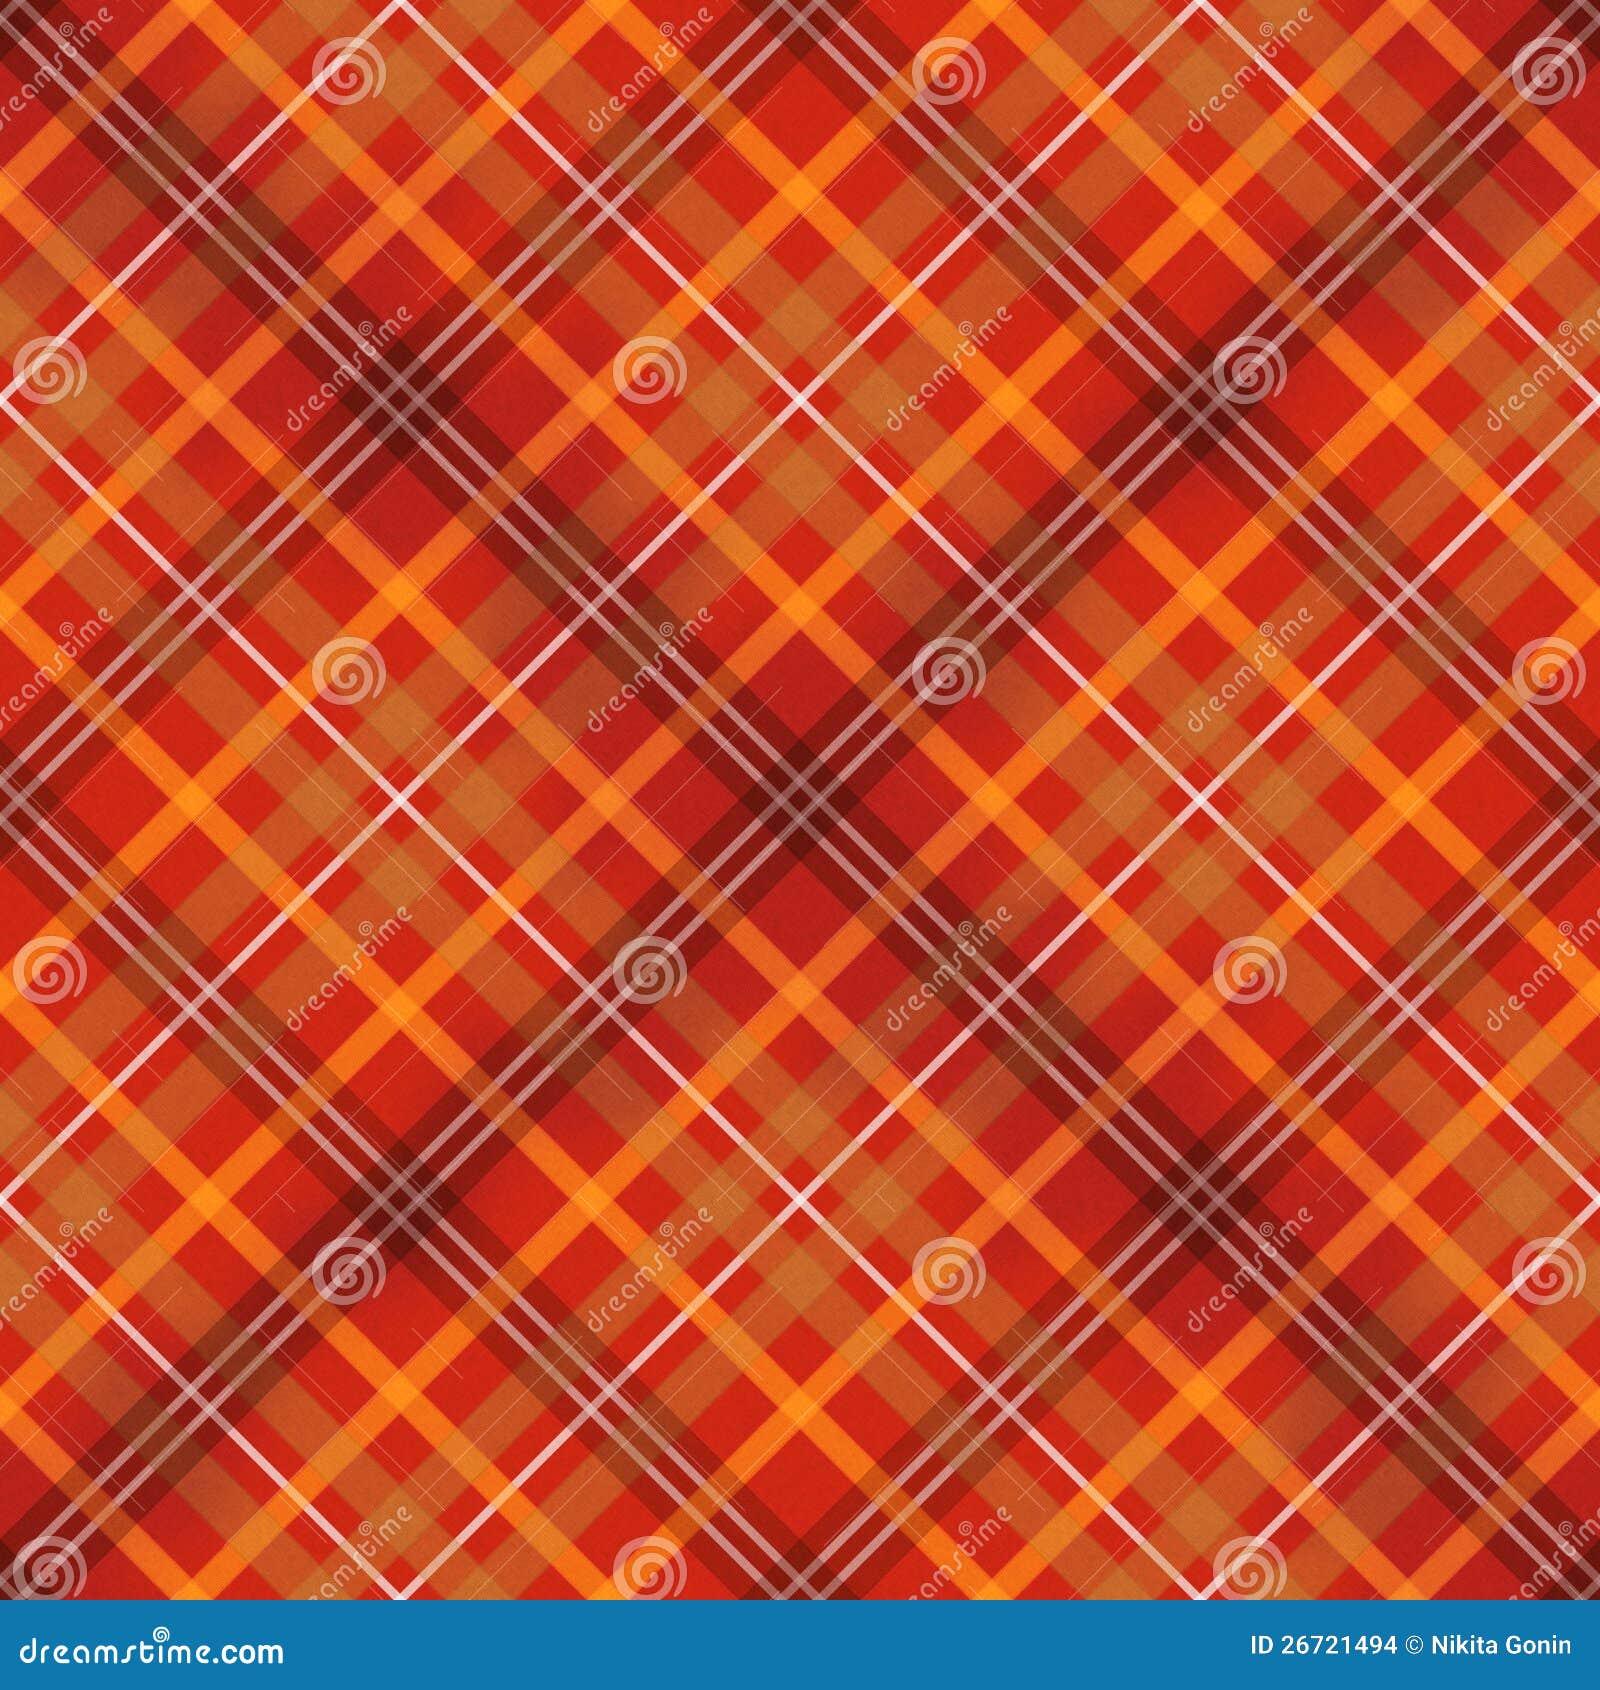 Red Scottish Checked Fabric Seamless Pattern Stock